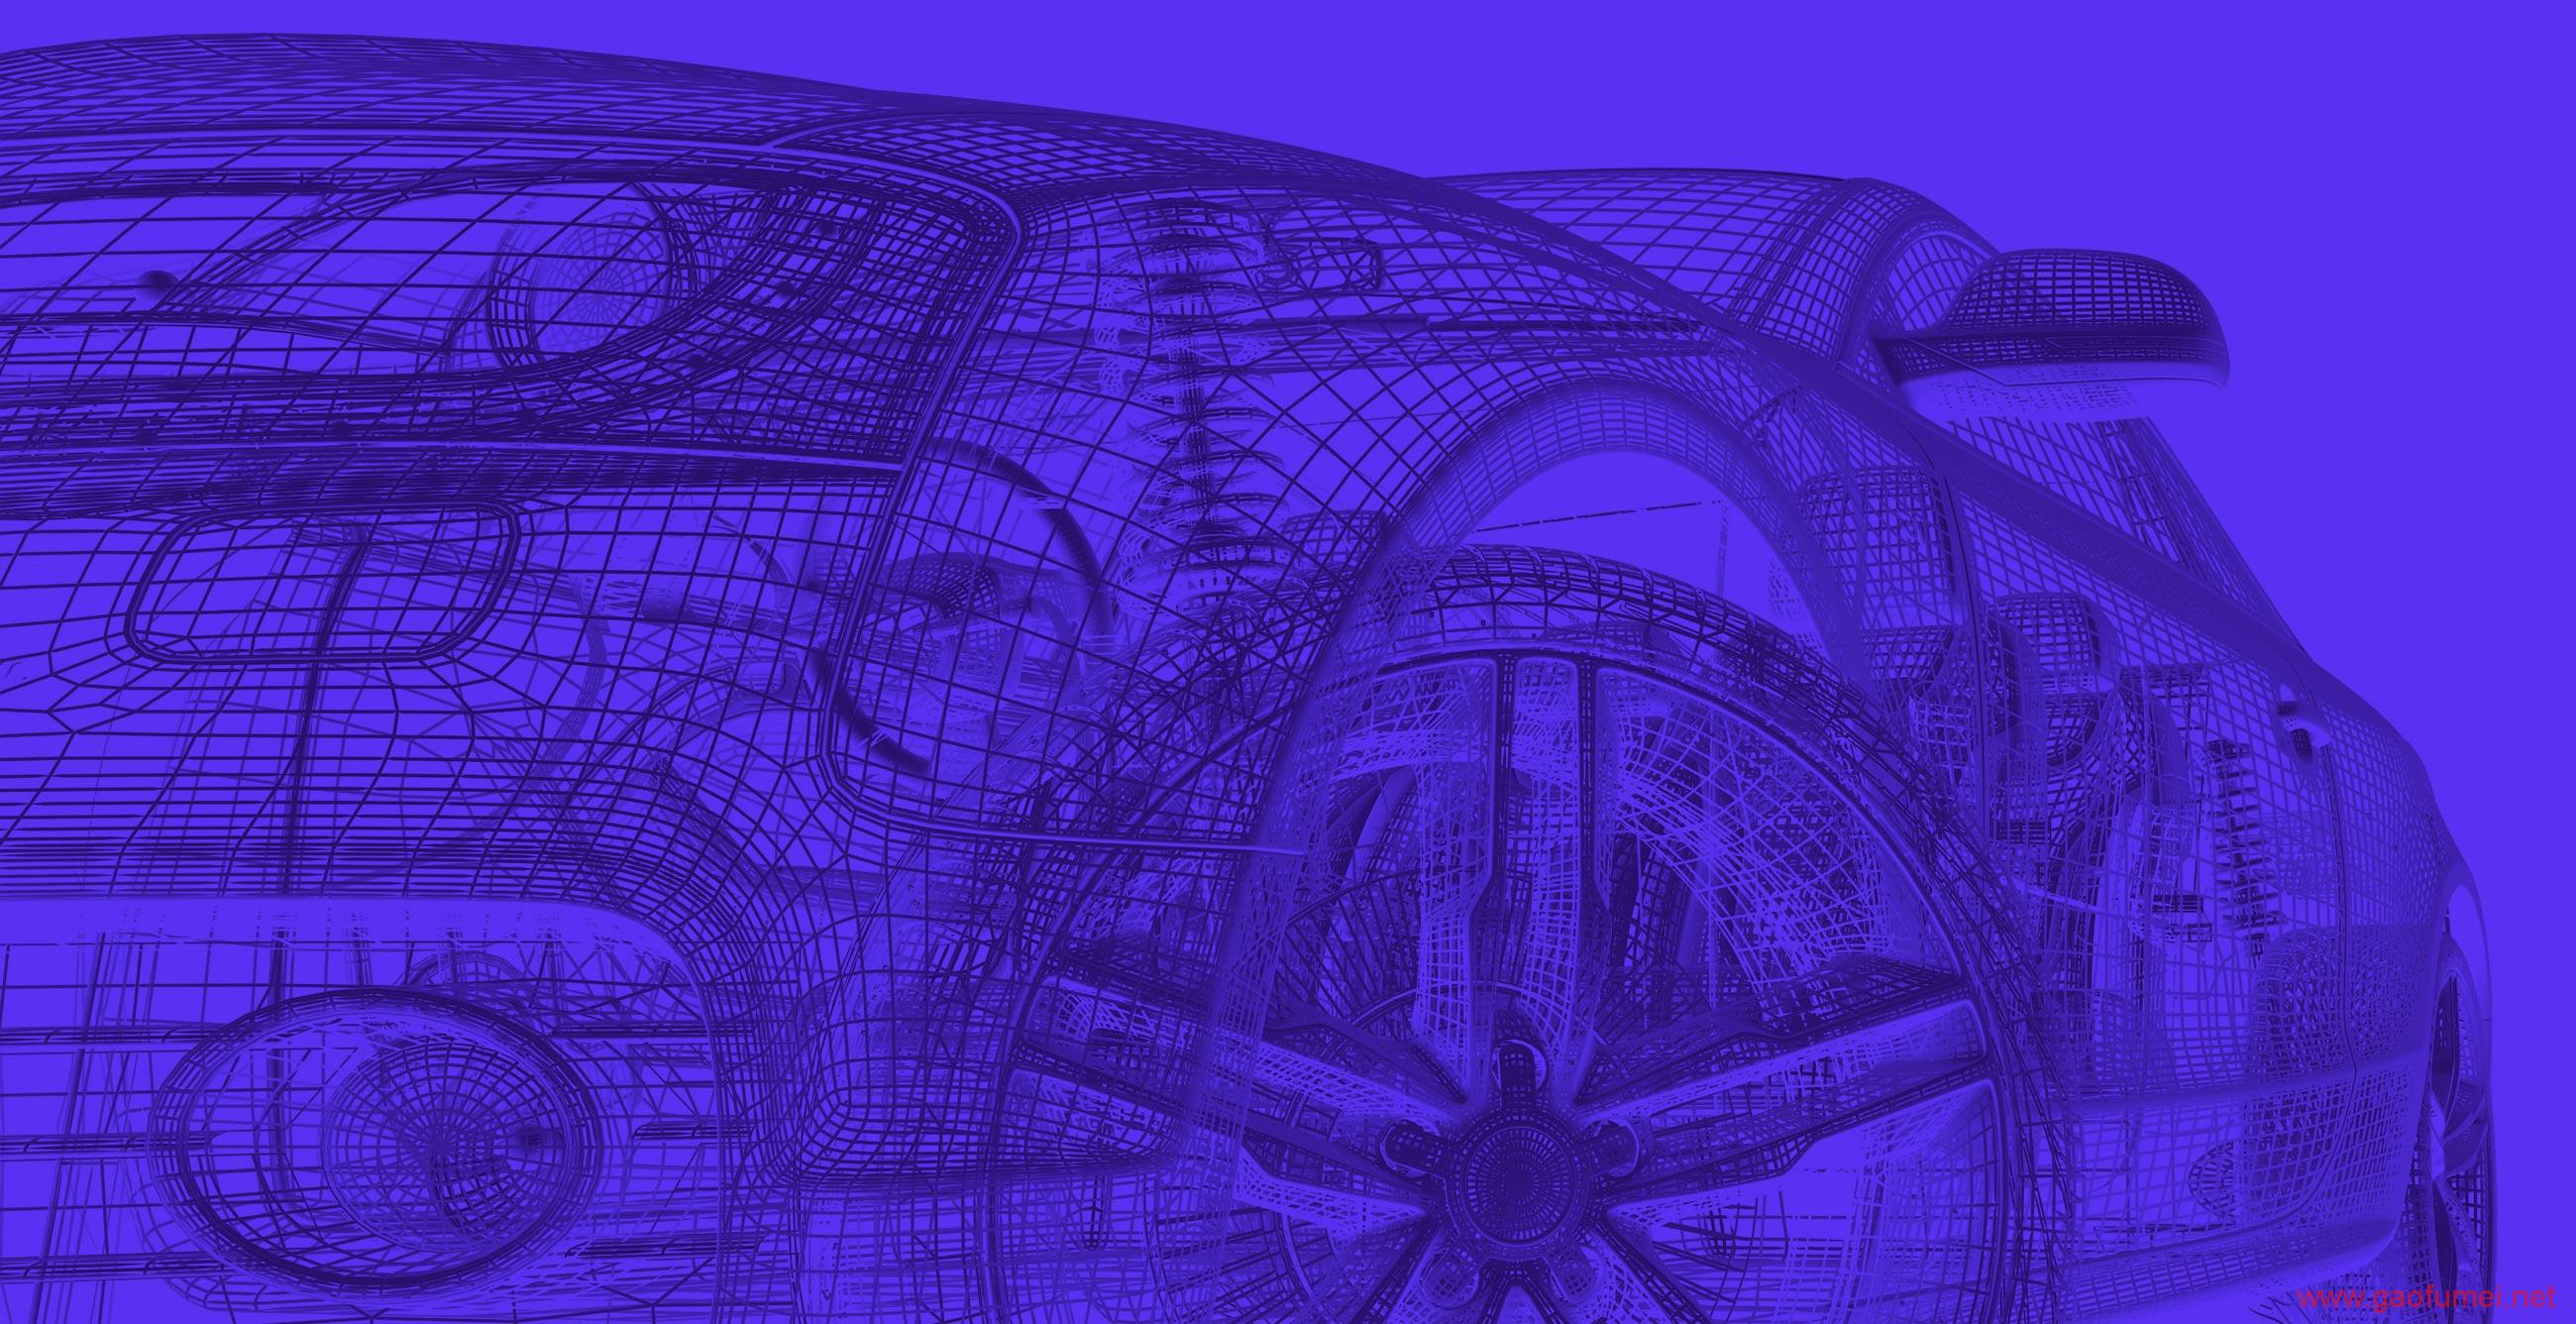 VRgineers发布5K分辨率VRHero头显虚拟世界纤毫毕现 虚拟现实 第4张-泥人传说